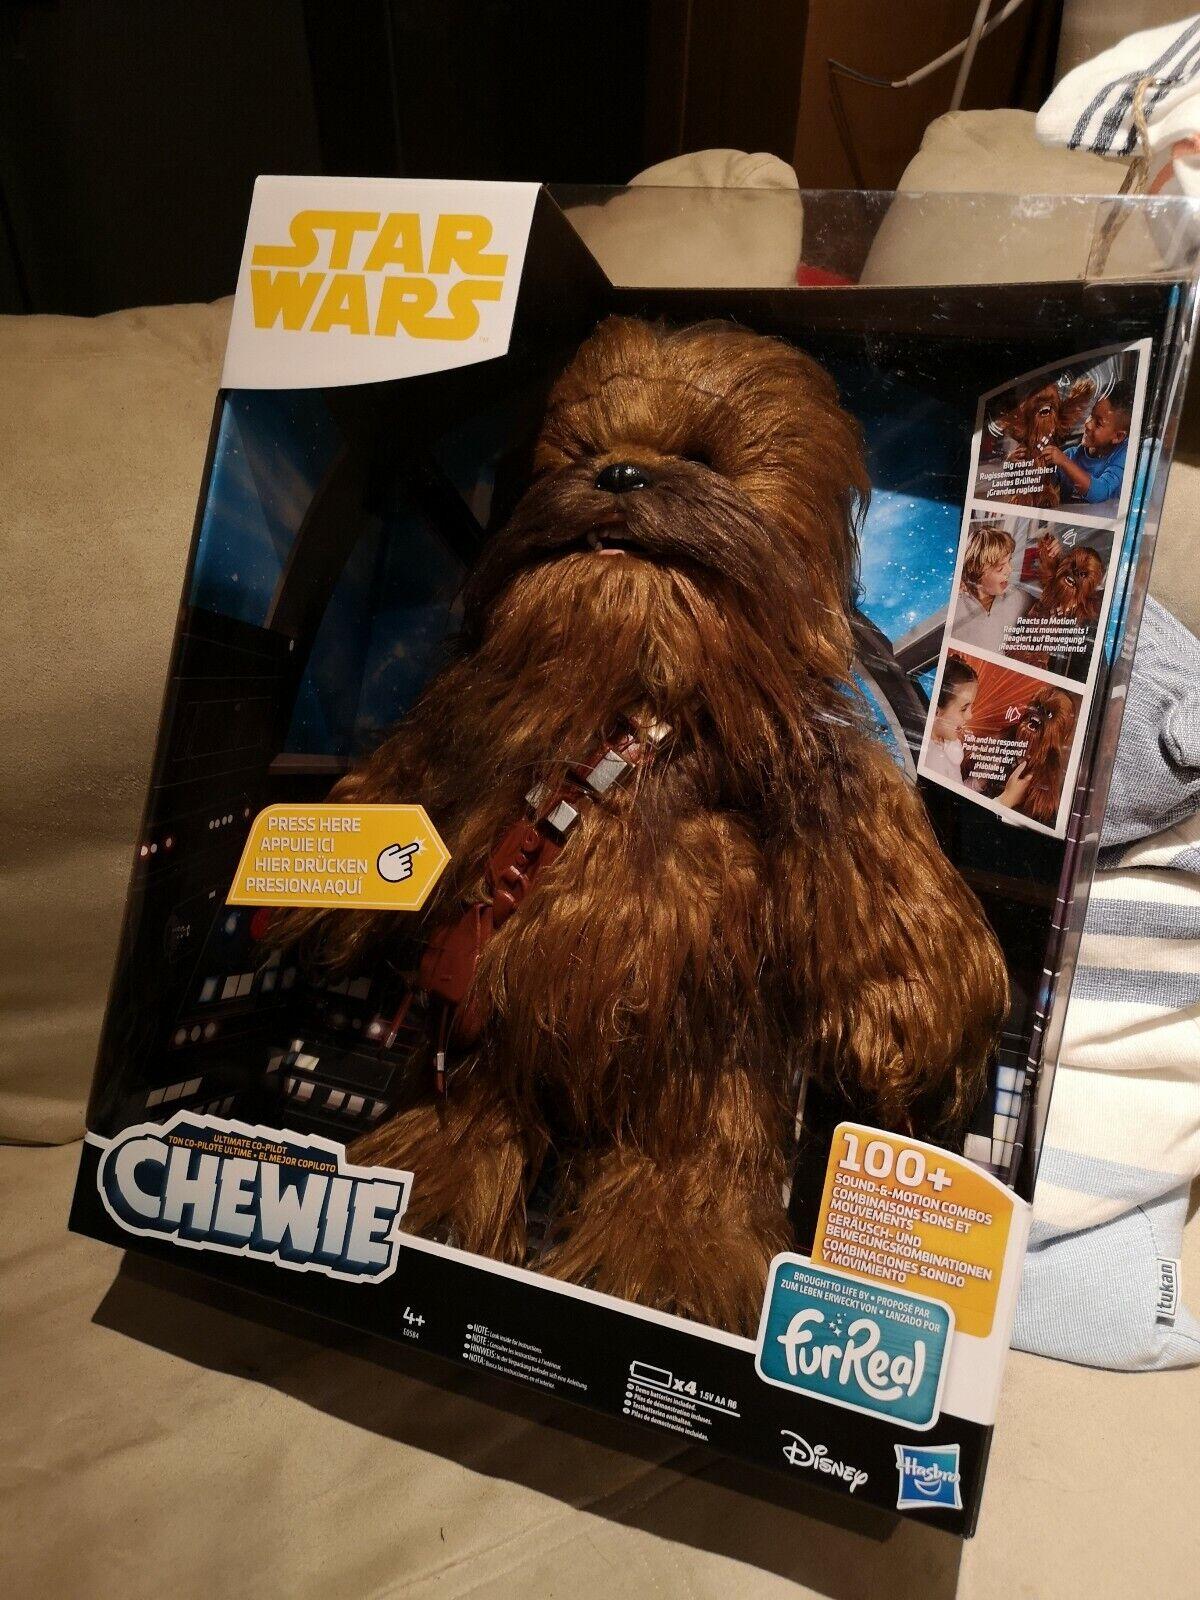 FurReal Star Wars - Chewbacca, interaktive Plüschfigur Neuware